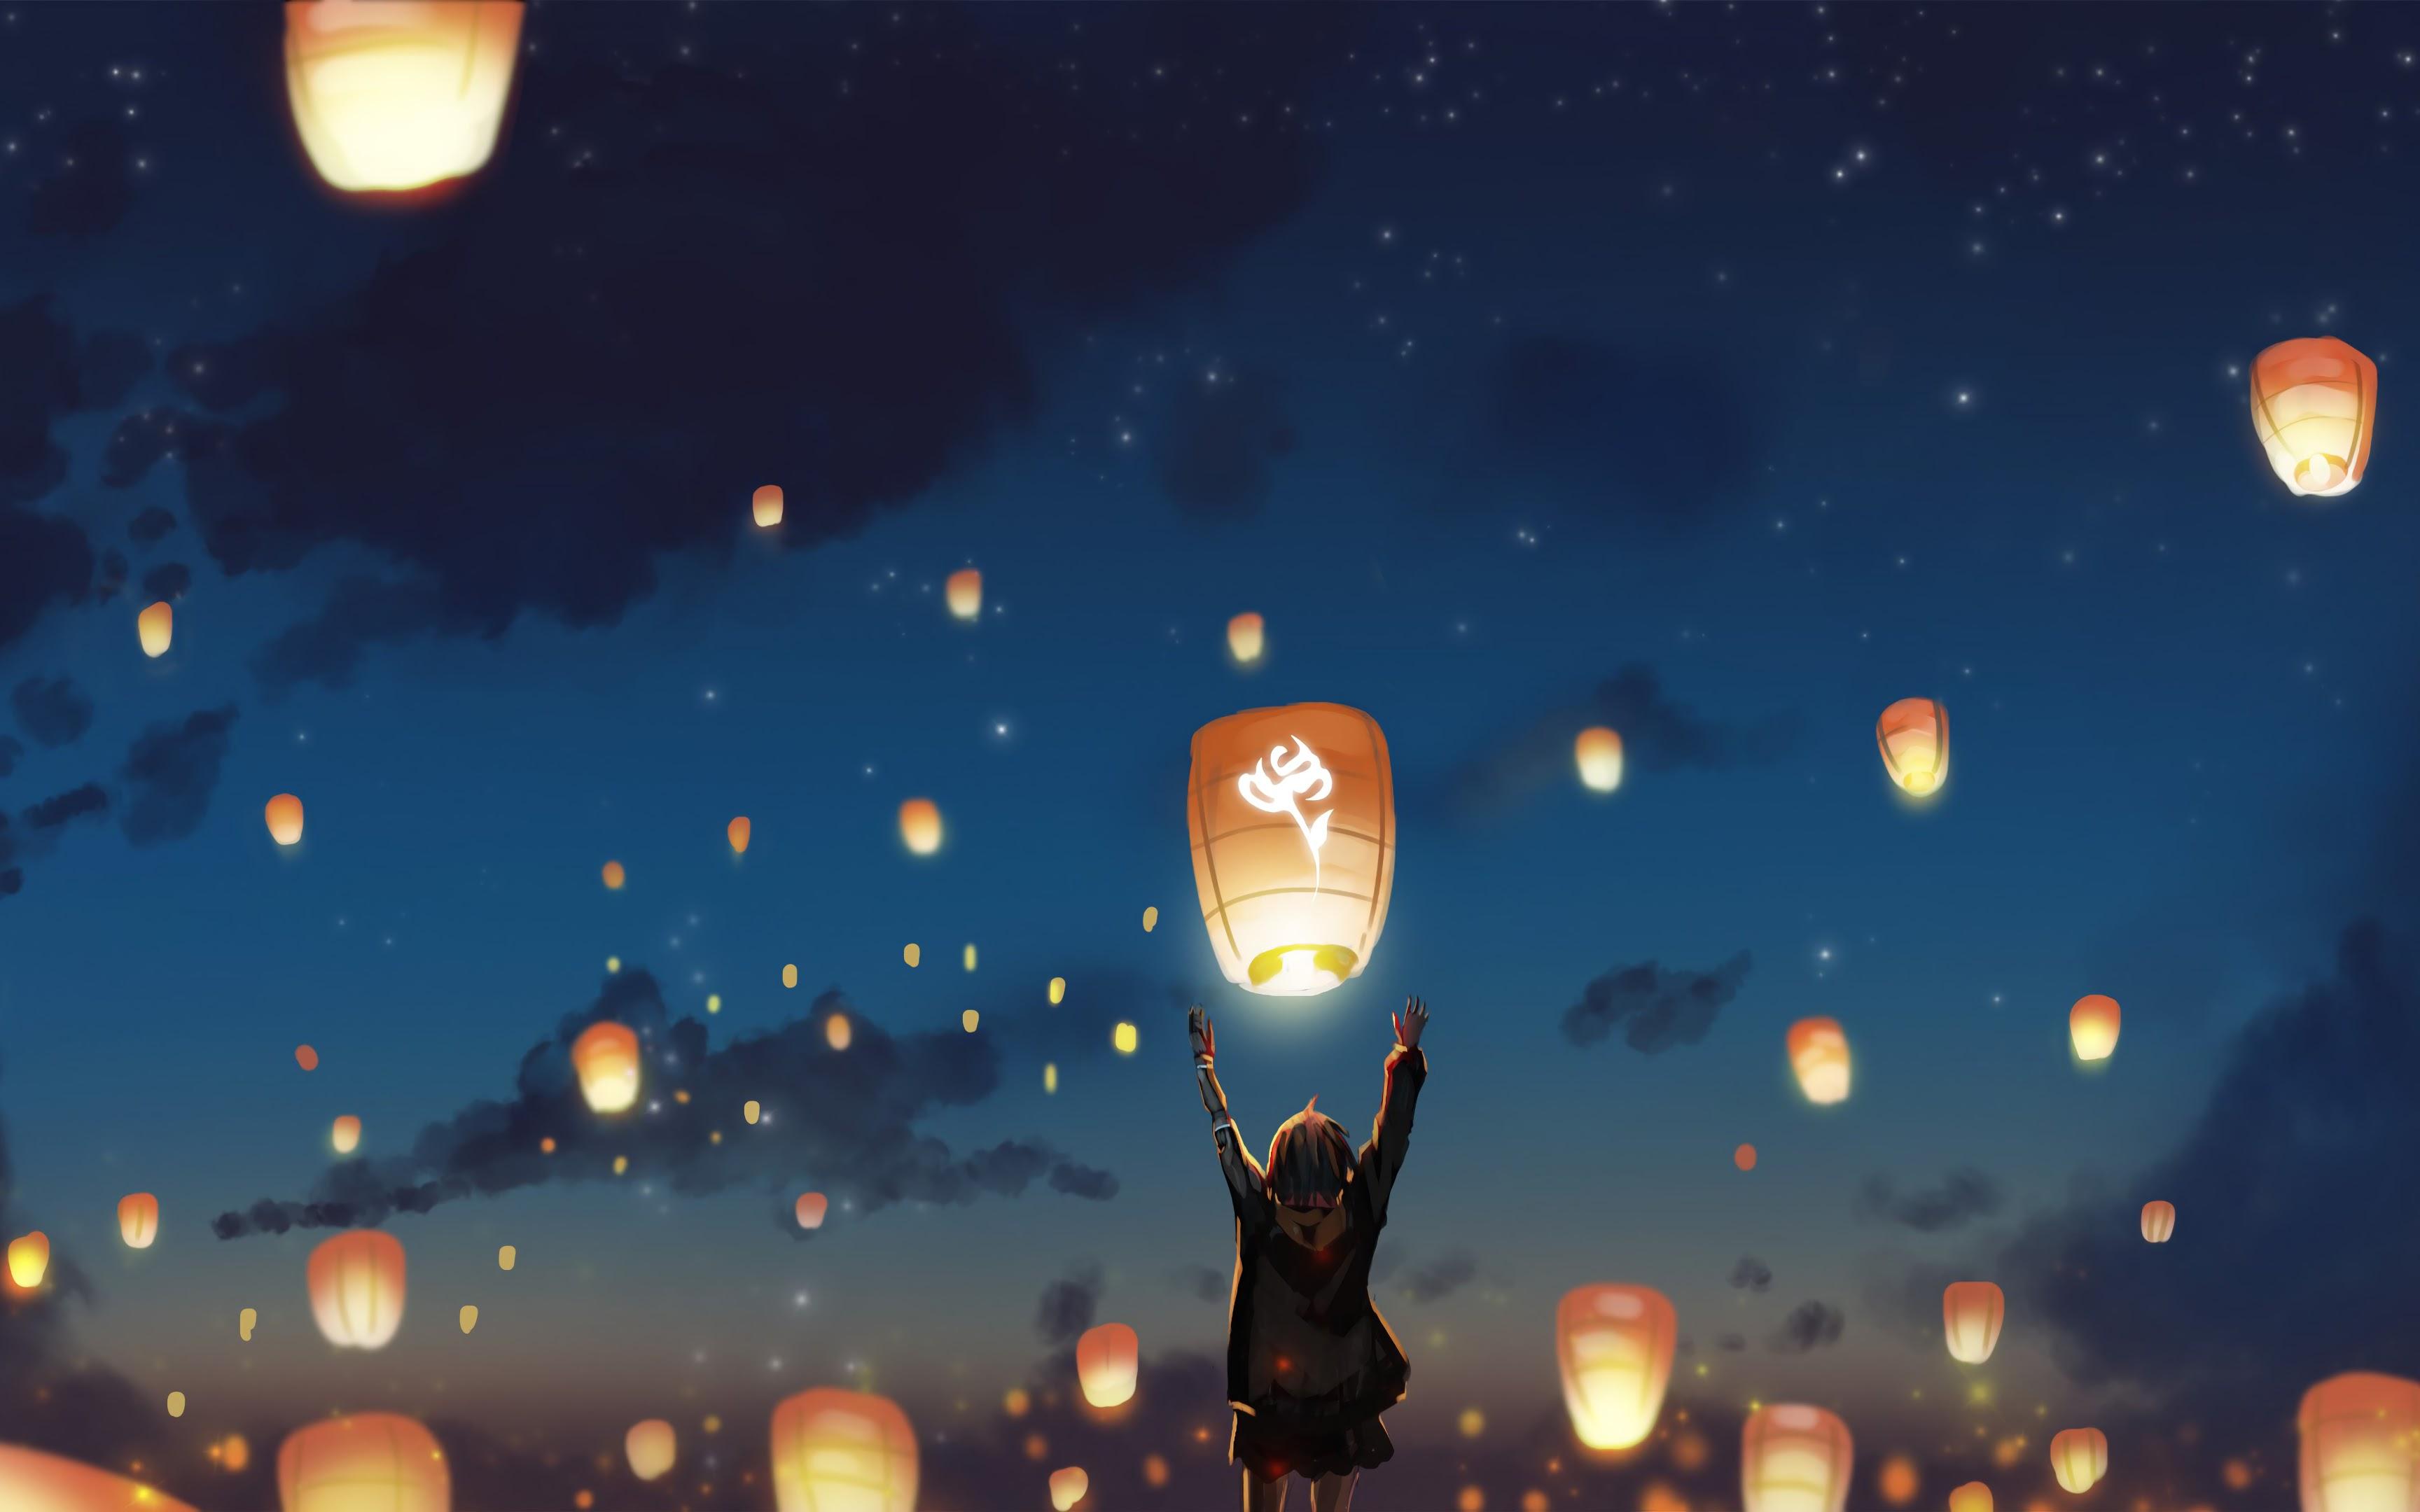 Sky Lantern, Scenery, Anime, 4K, #133 Wallpaper